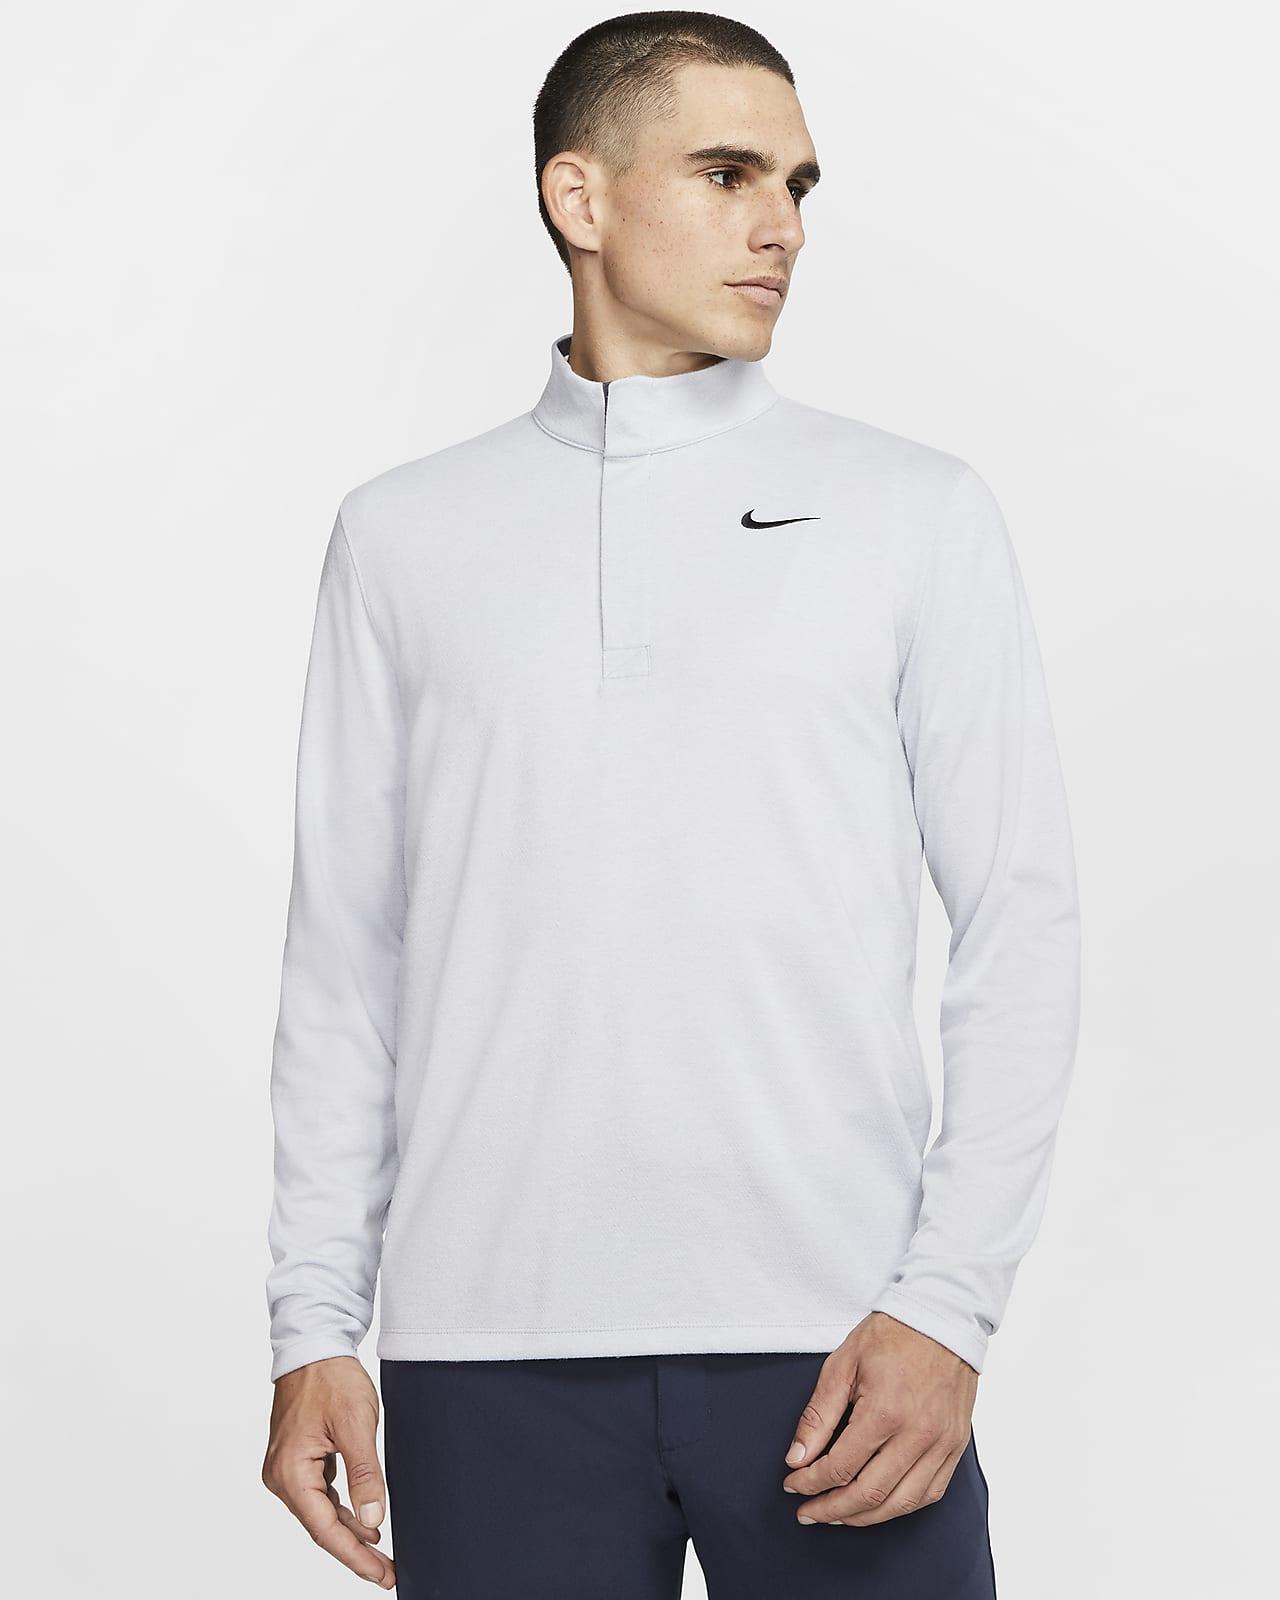 Nike Dri-FIT Victory Men's 1/2-Zip Golf Top